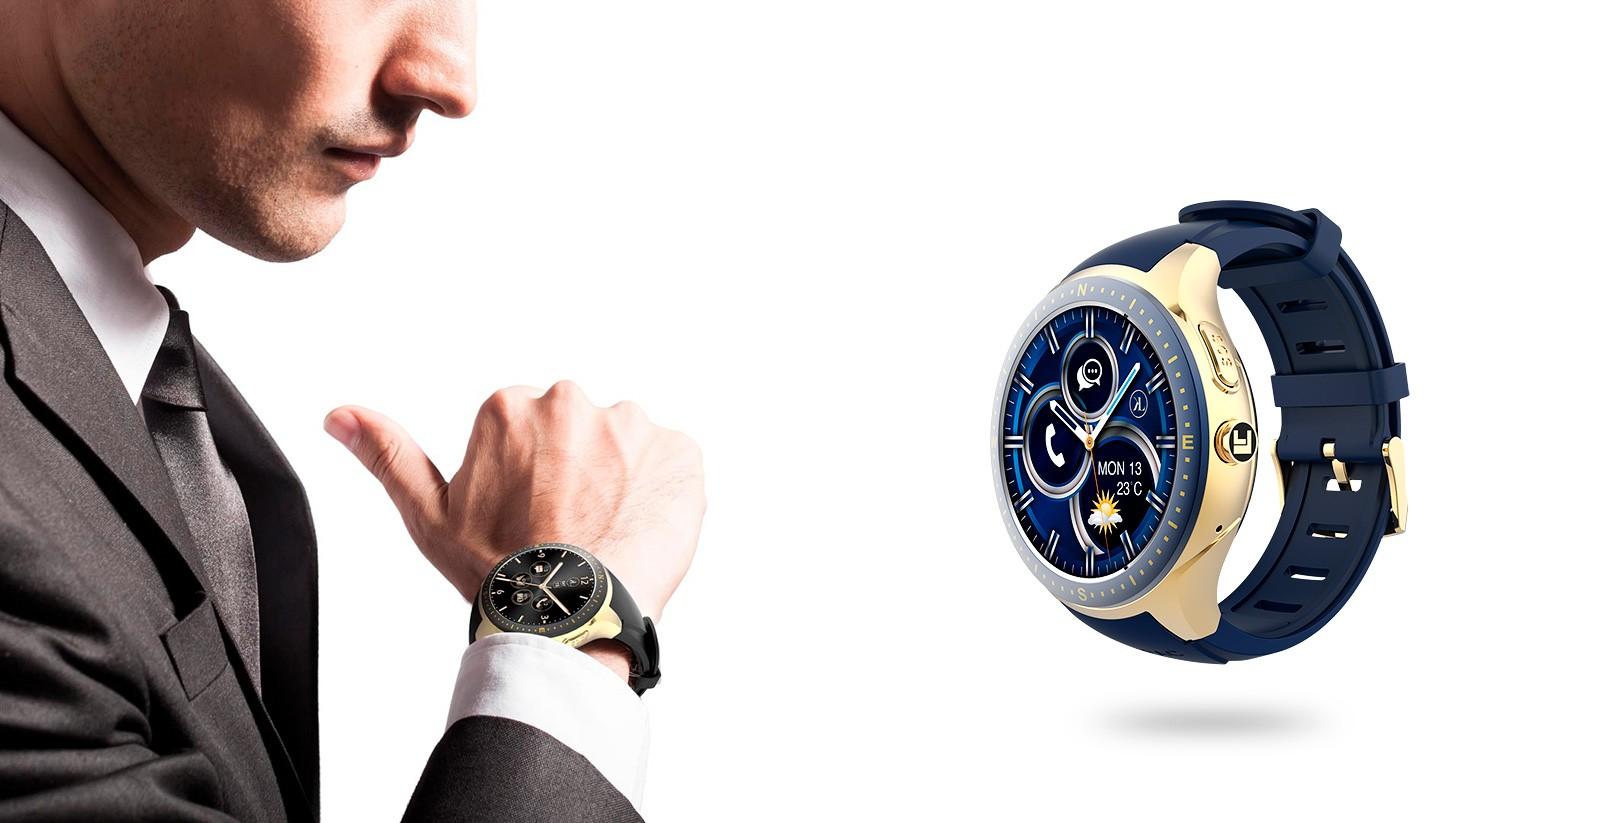 Laipac smartwatch